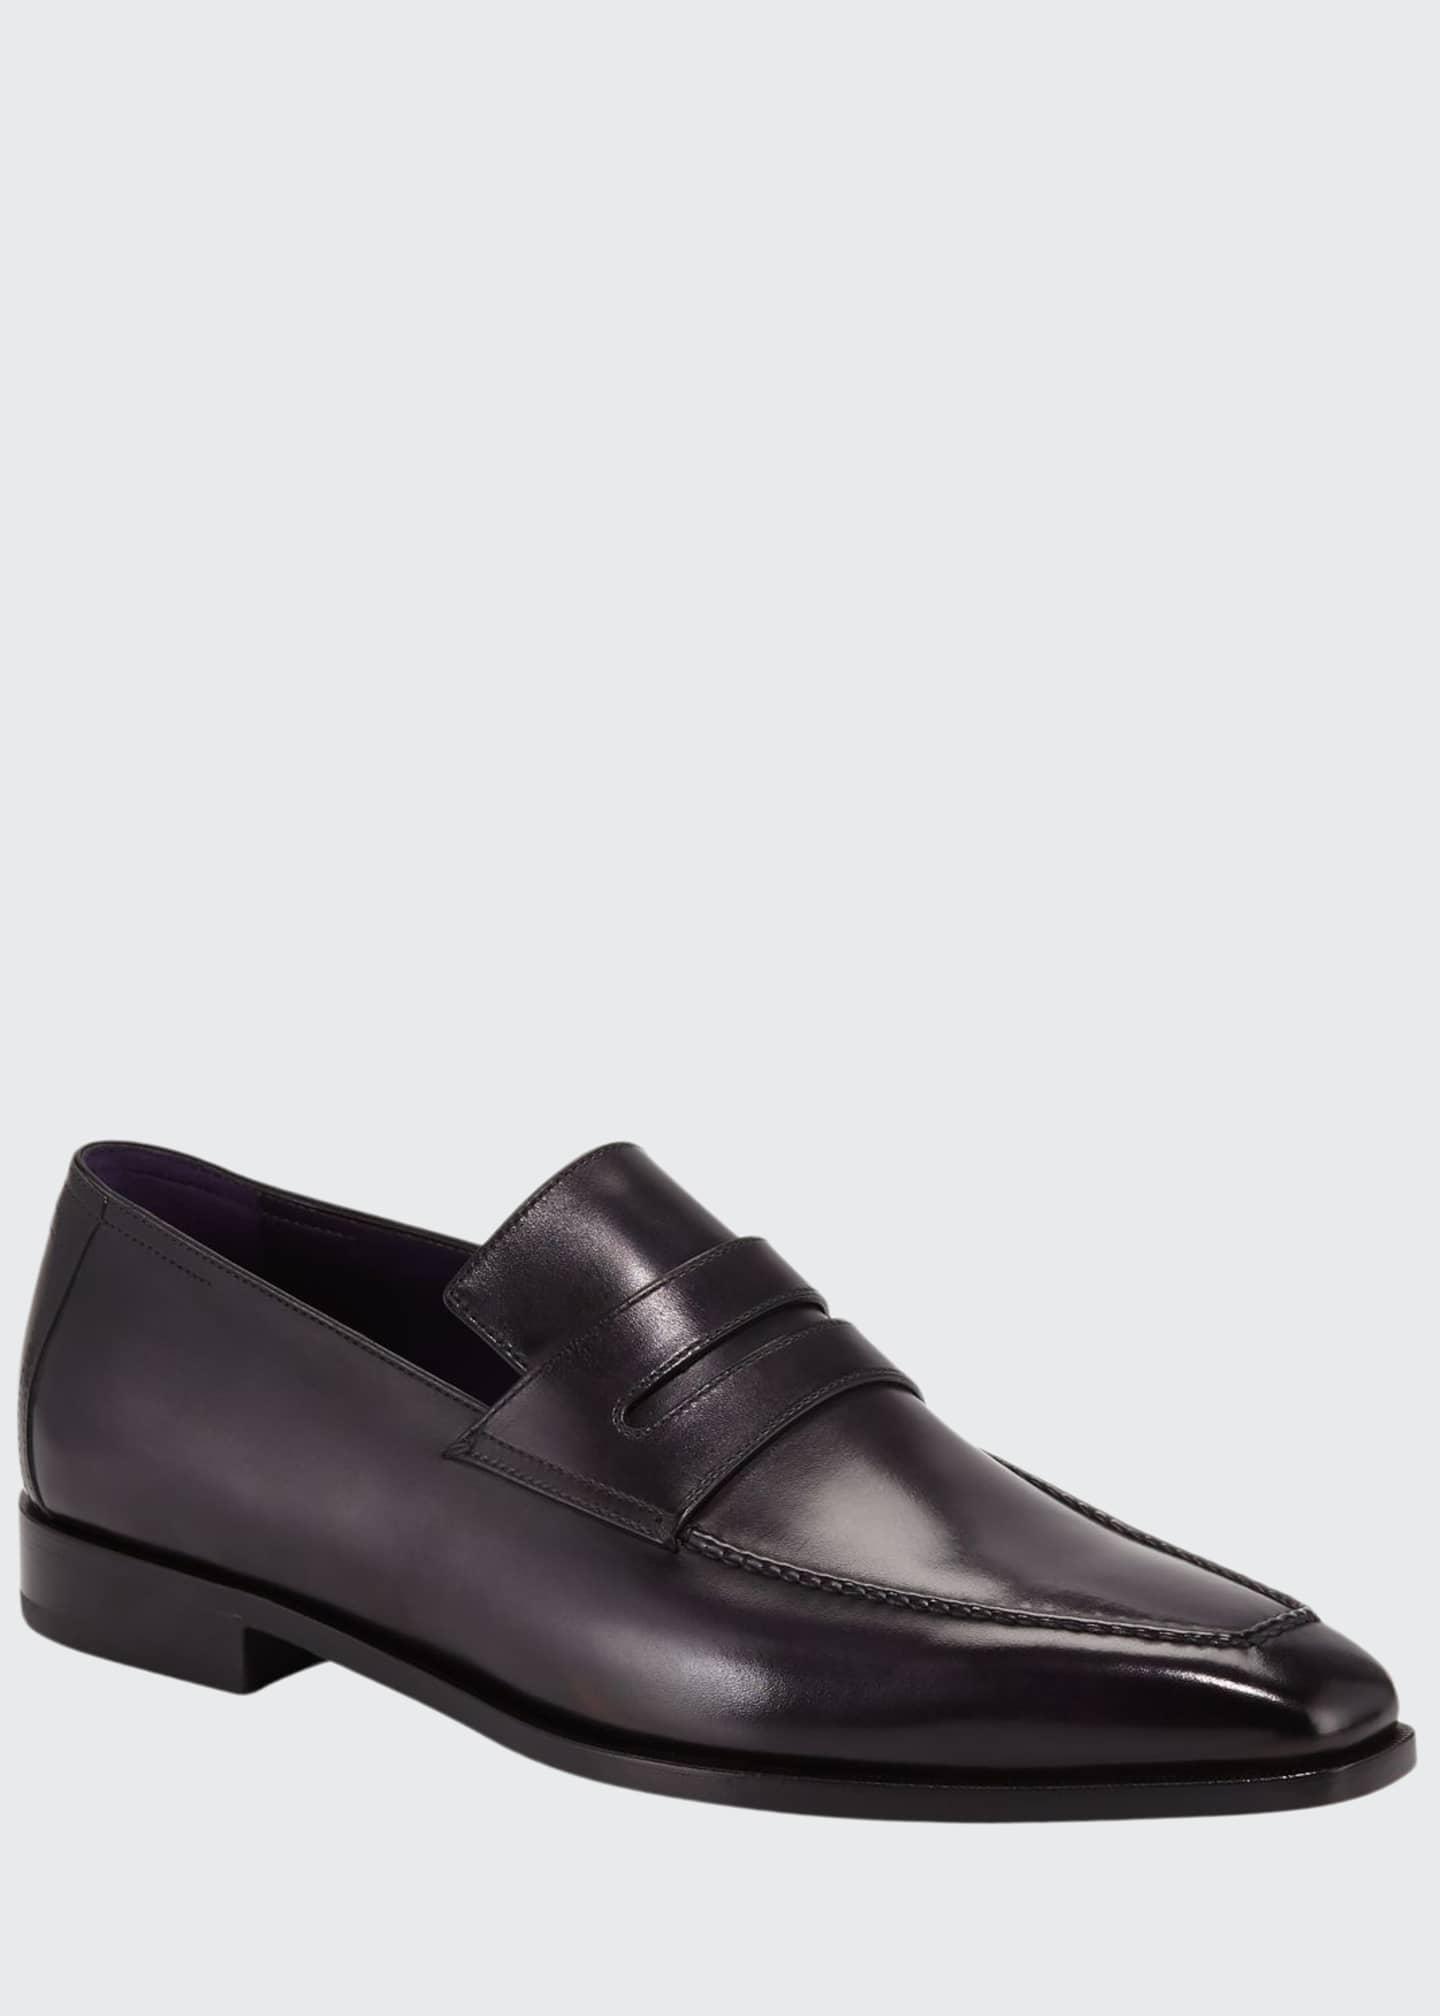 Berluti Men's Andy Demesure Calf Leather Loafer